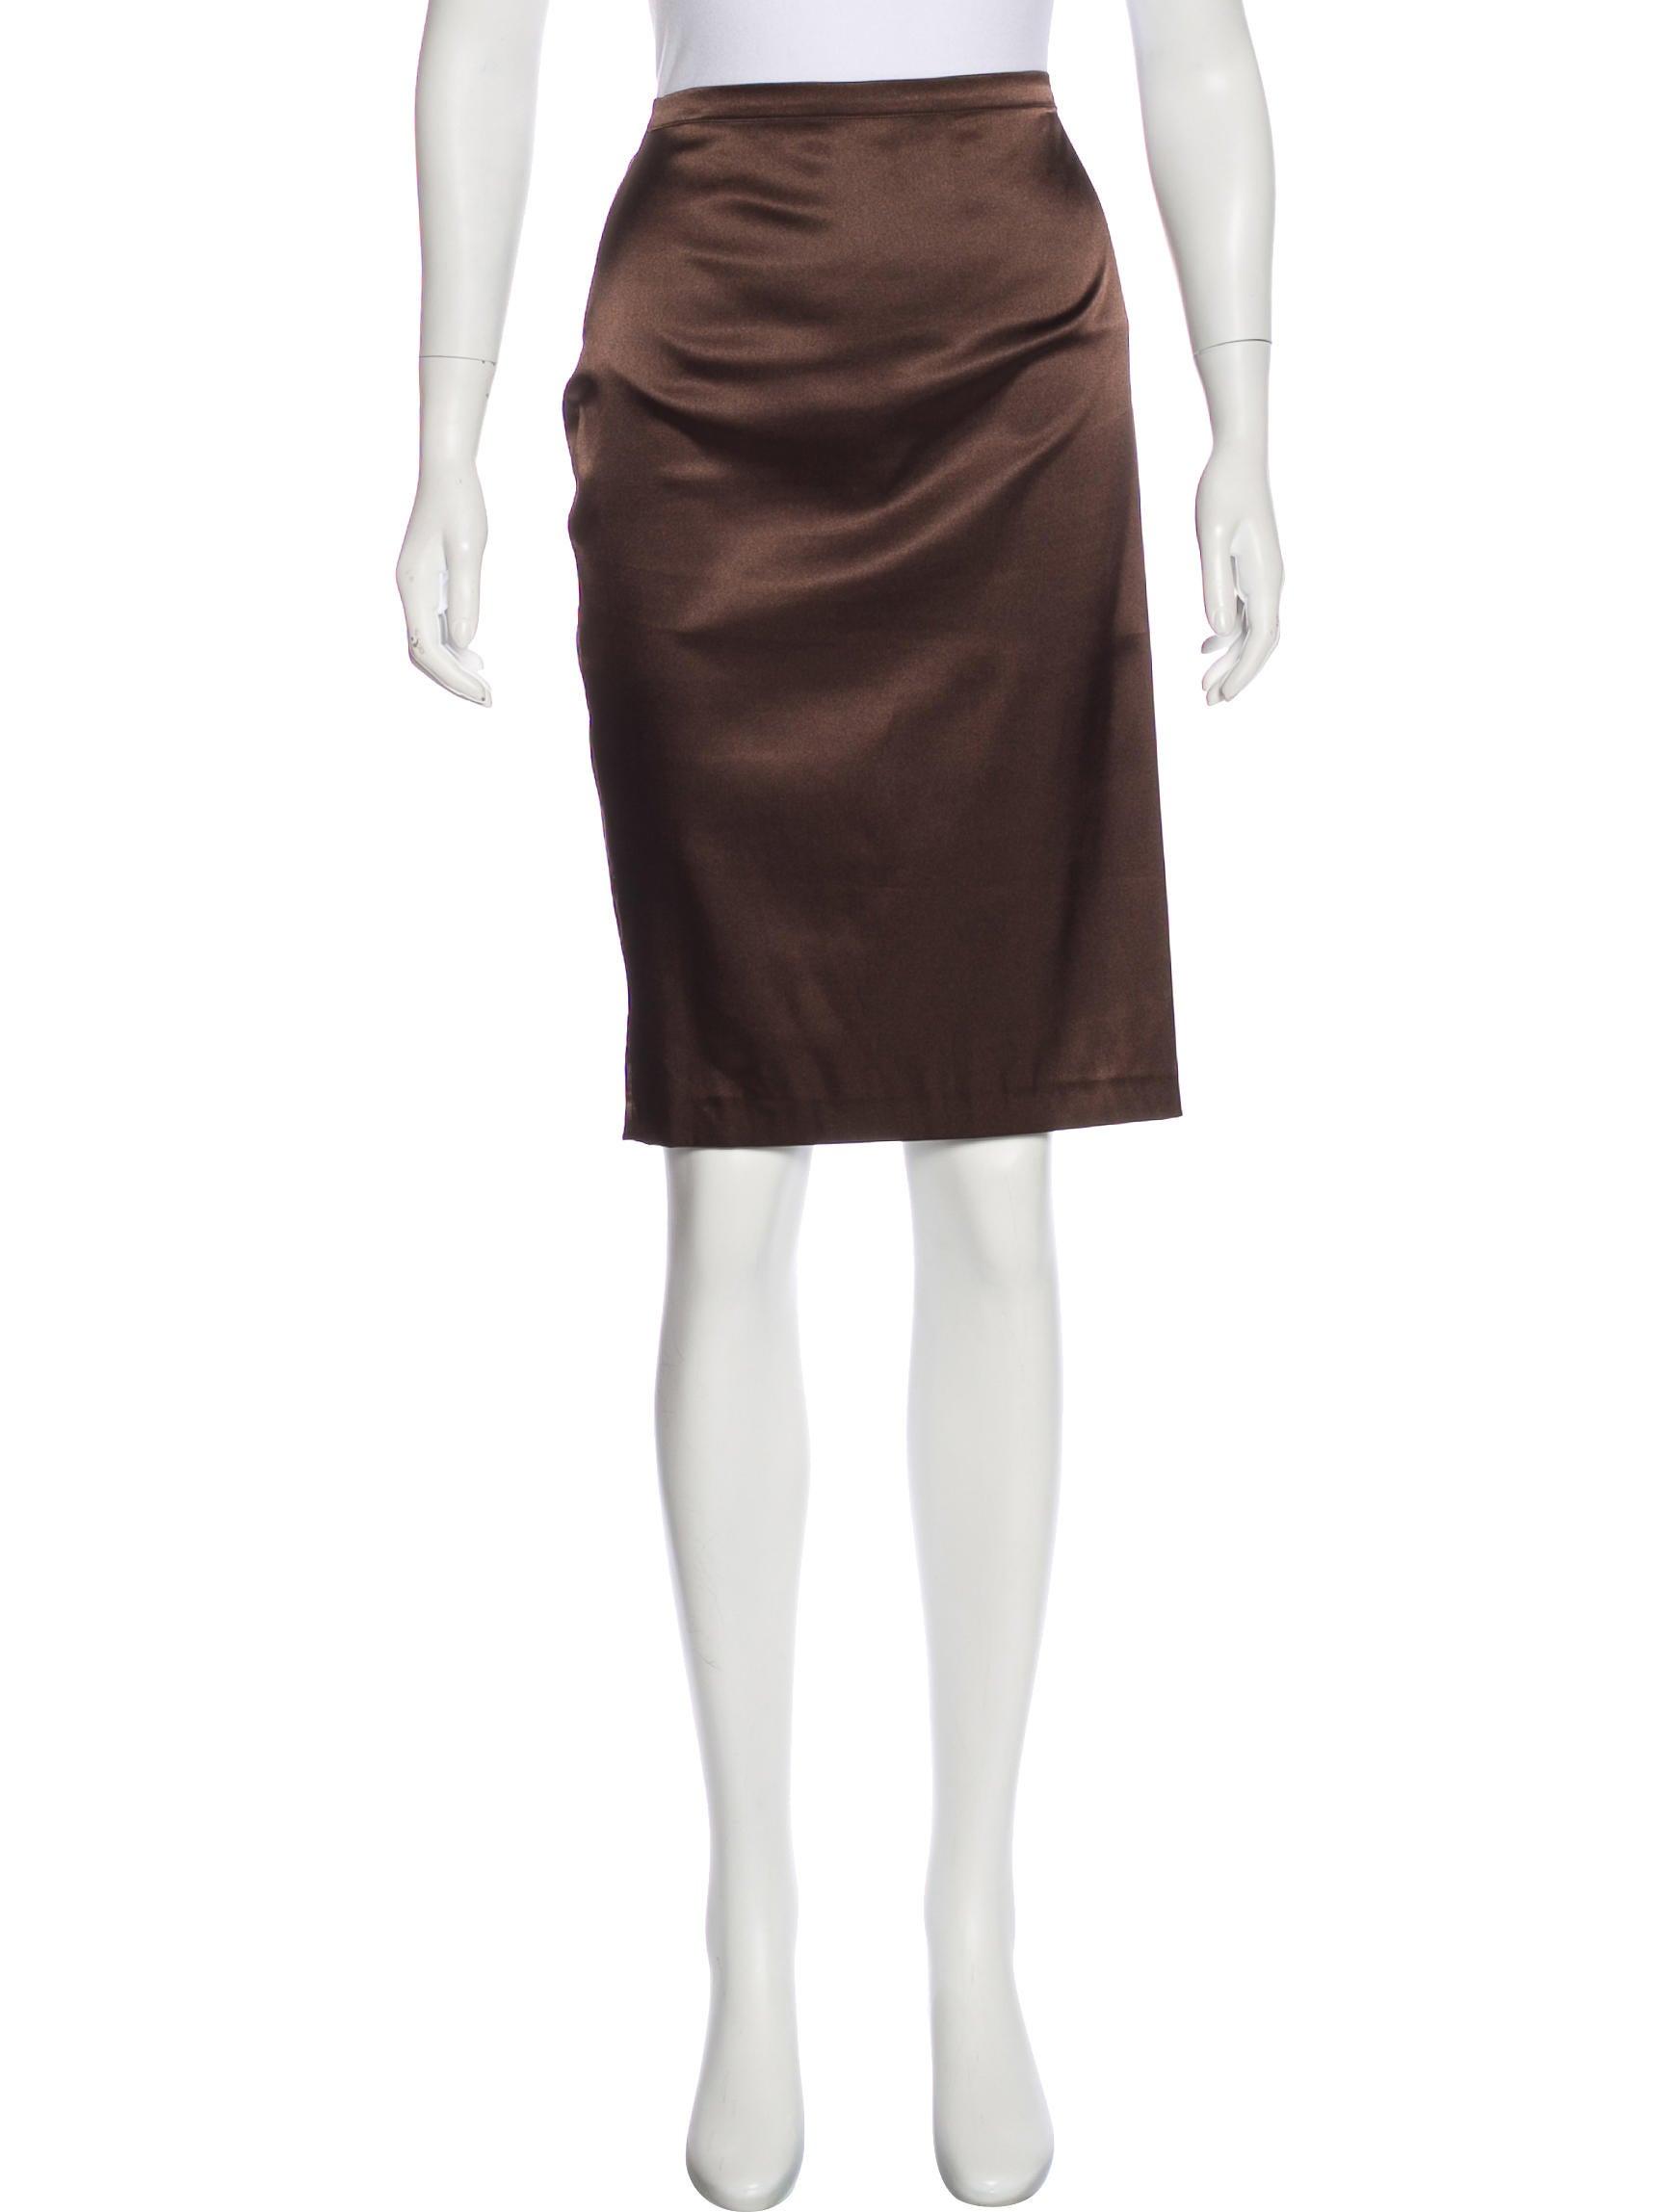 d g satin pencil skirt clothing wdg37894 the realreal